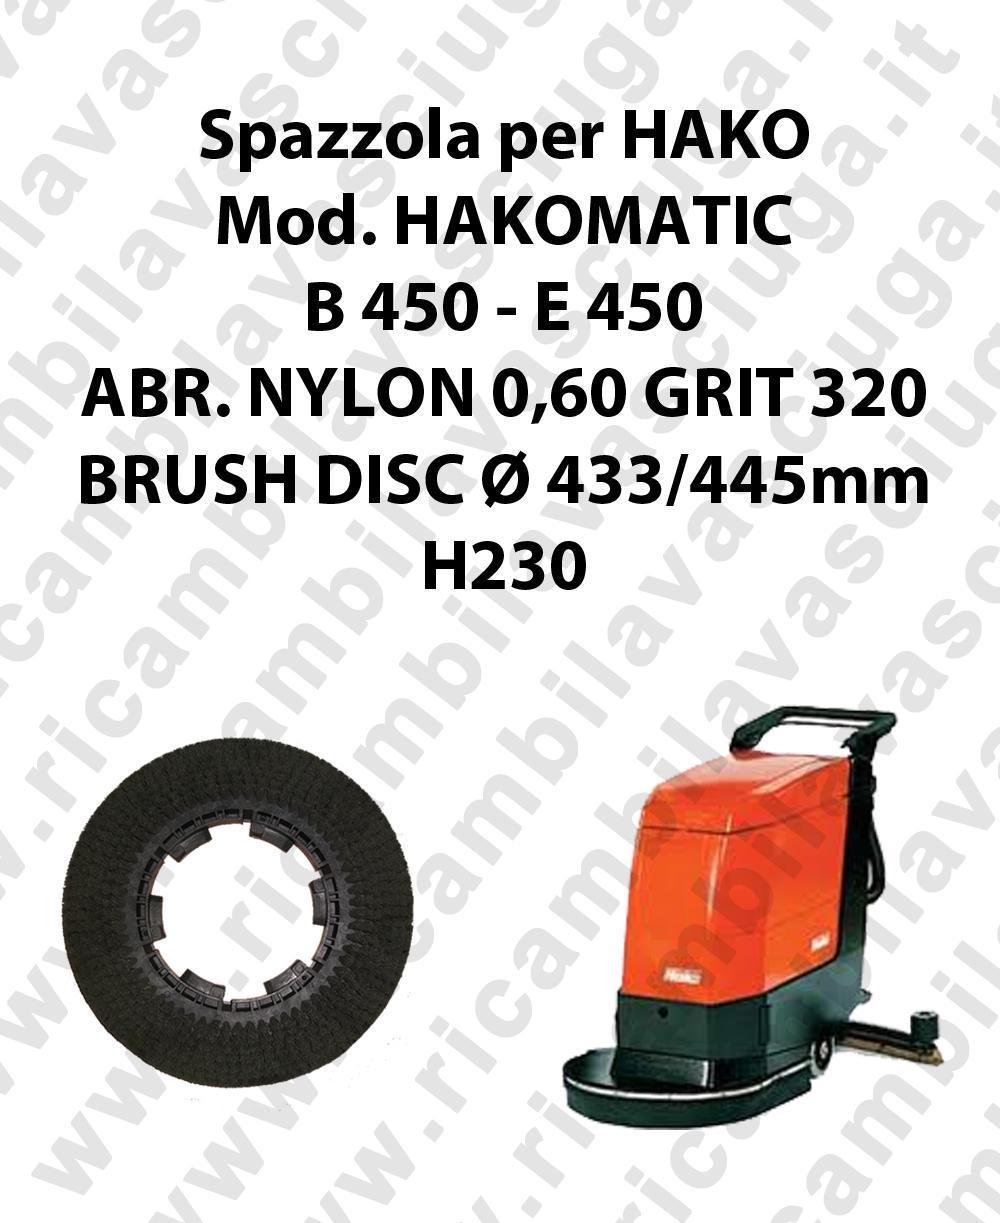 BROSSE A LAVER pour autolaveuses HAKO Reference HAKOMATIC B 450 - et 450